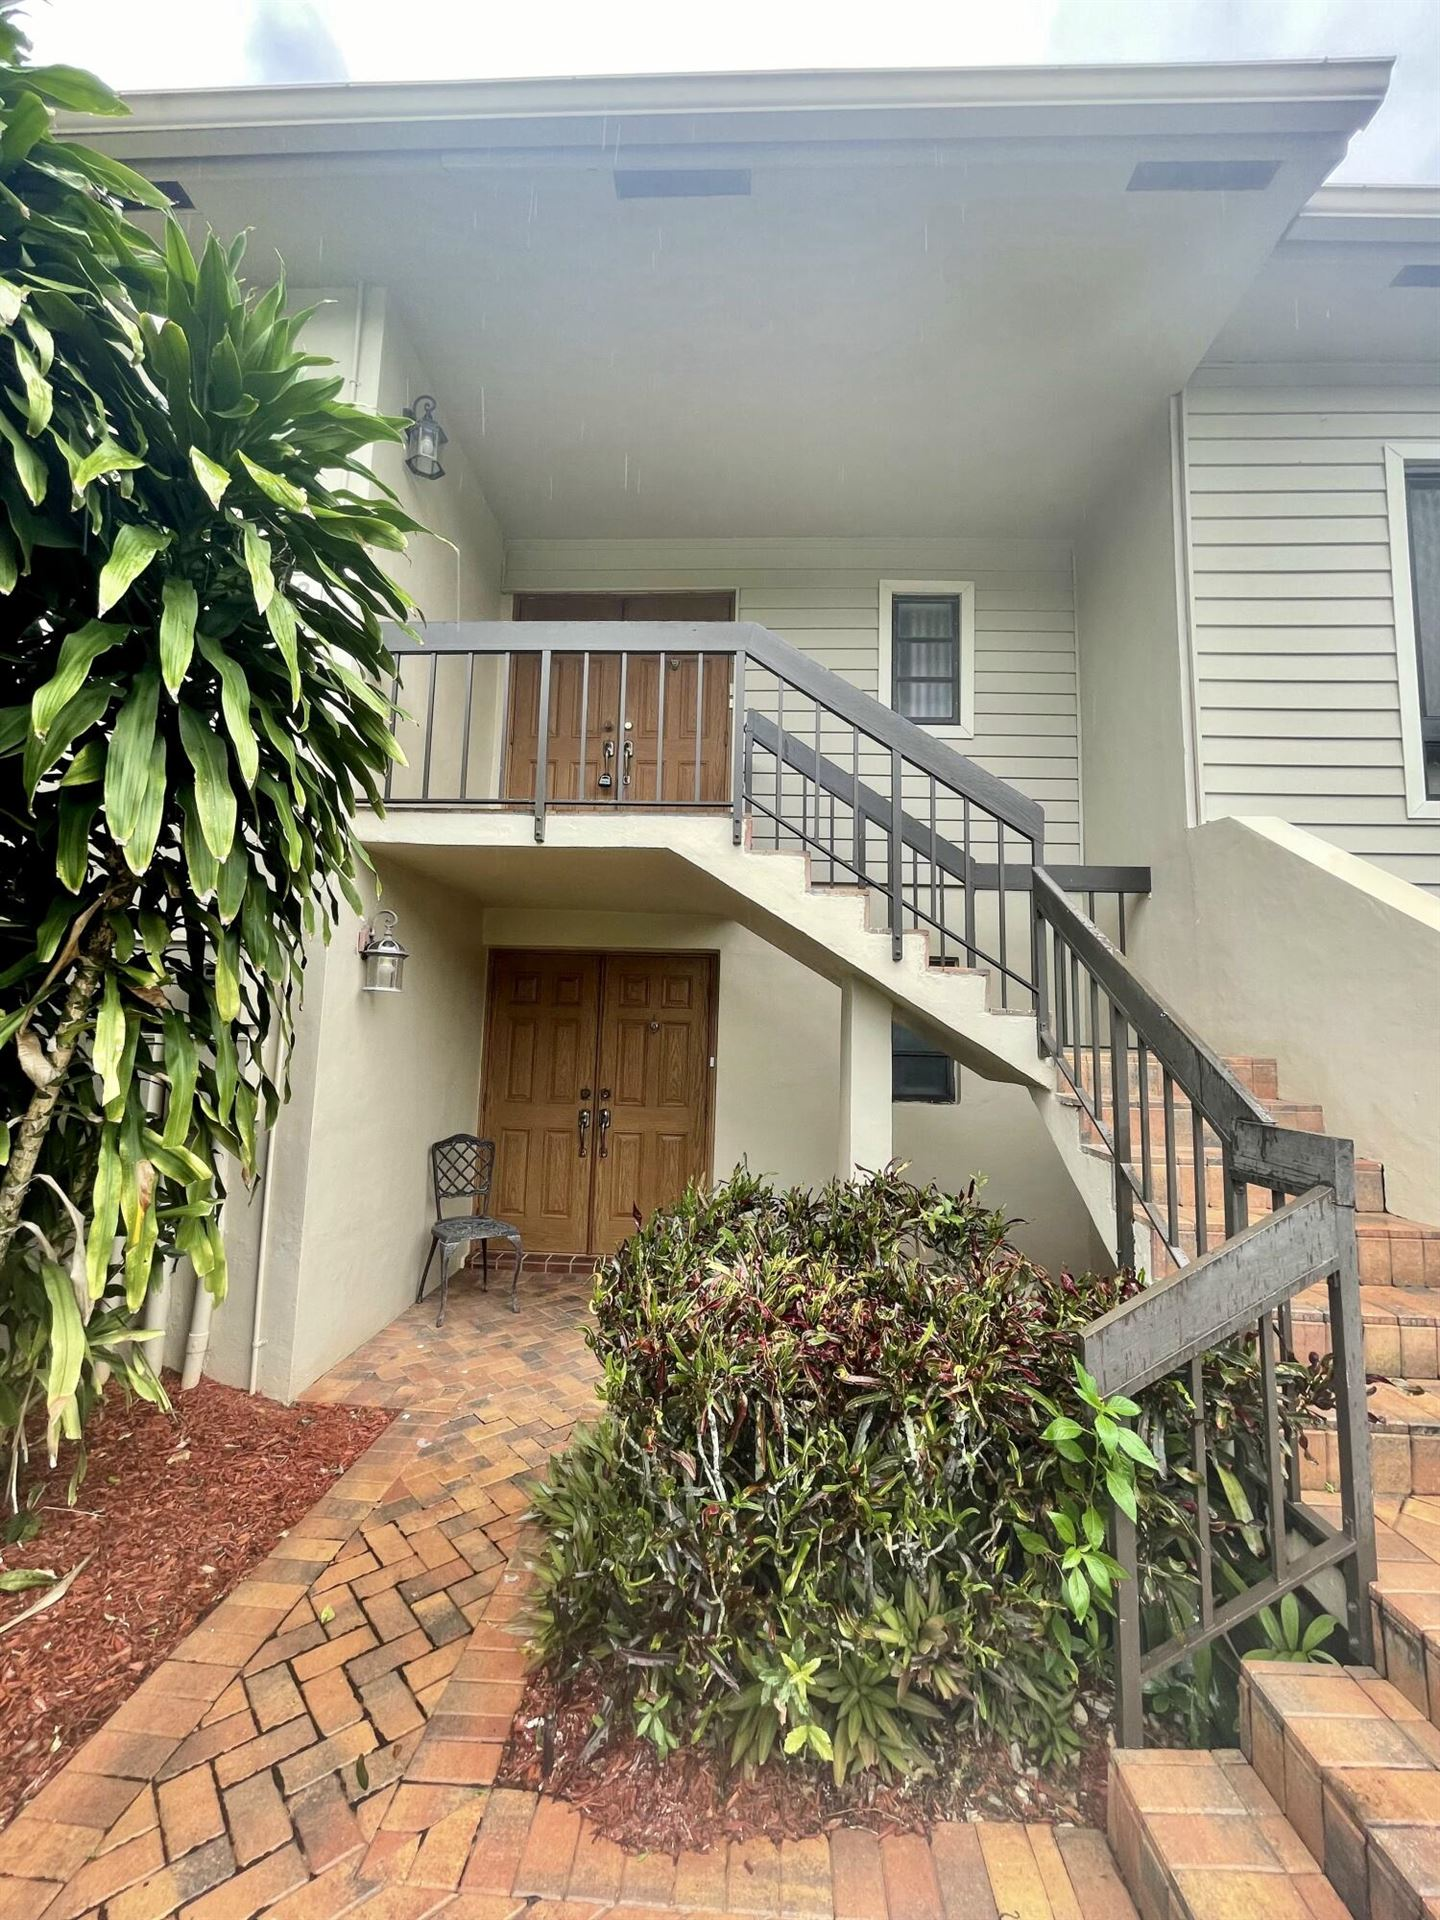 7770 Lakeside Boulevard #G302, Boca Raton, FL 33434 - MLS#: RX-10637355